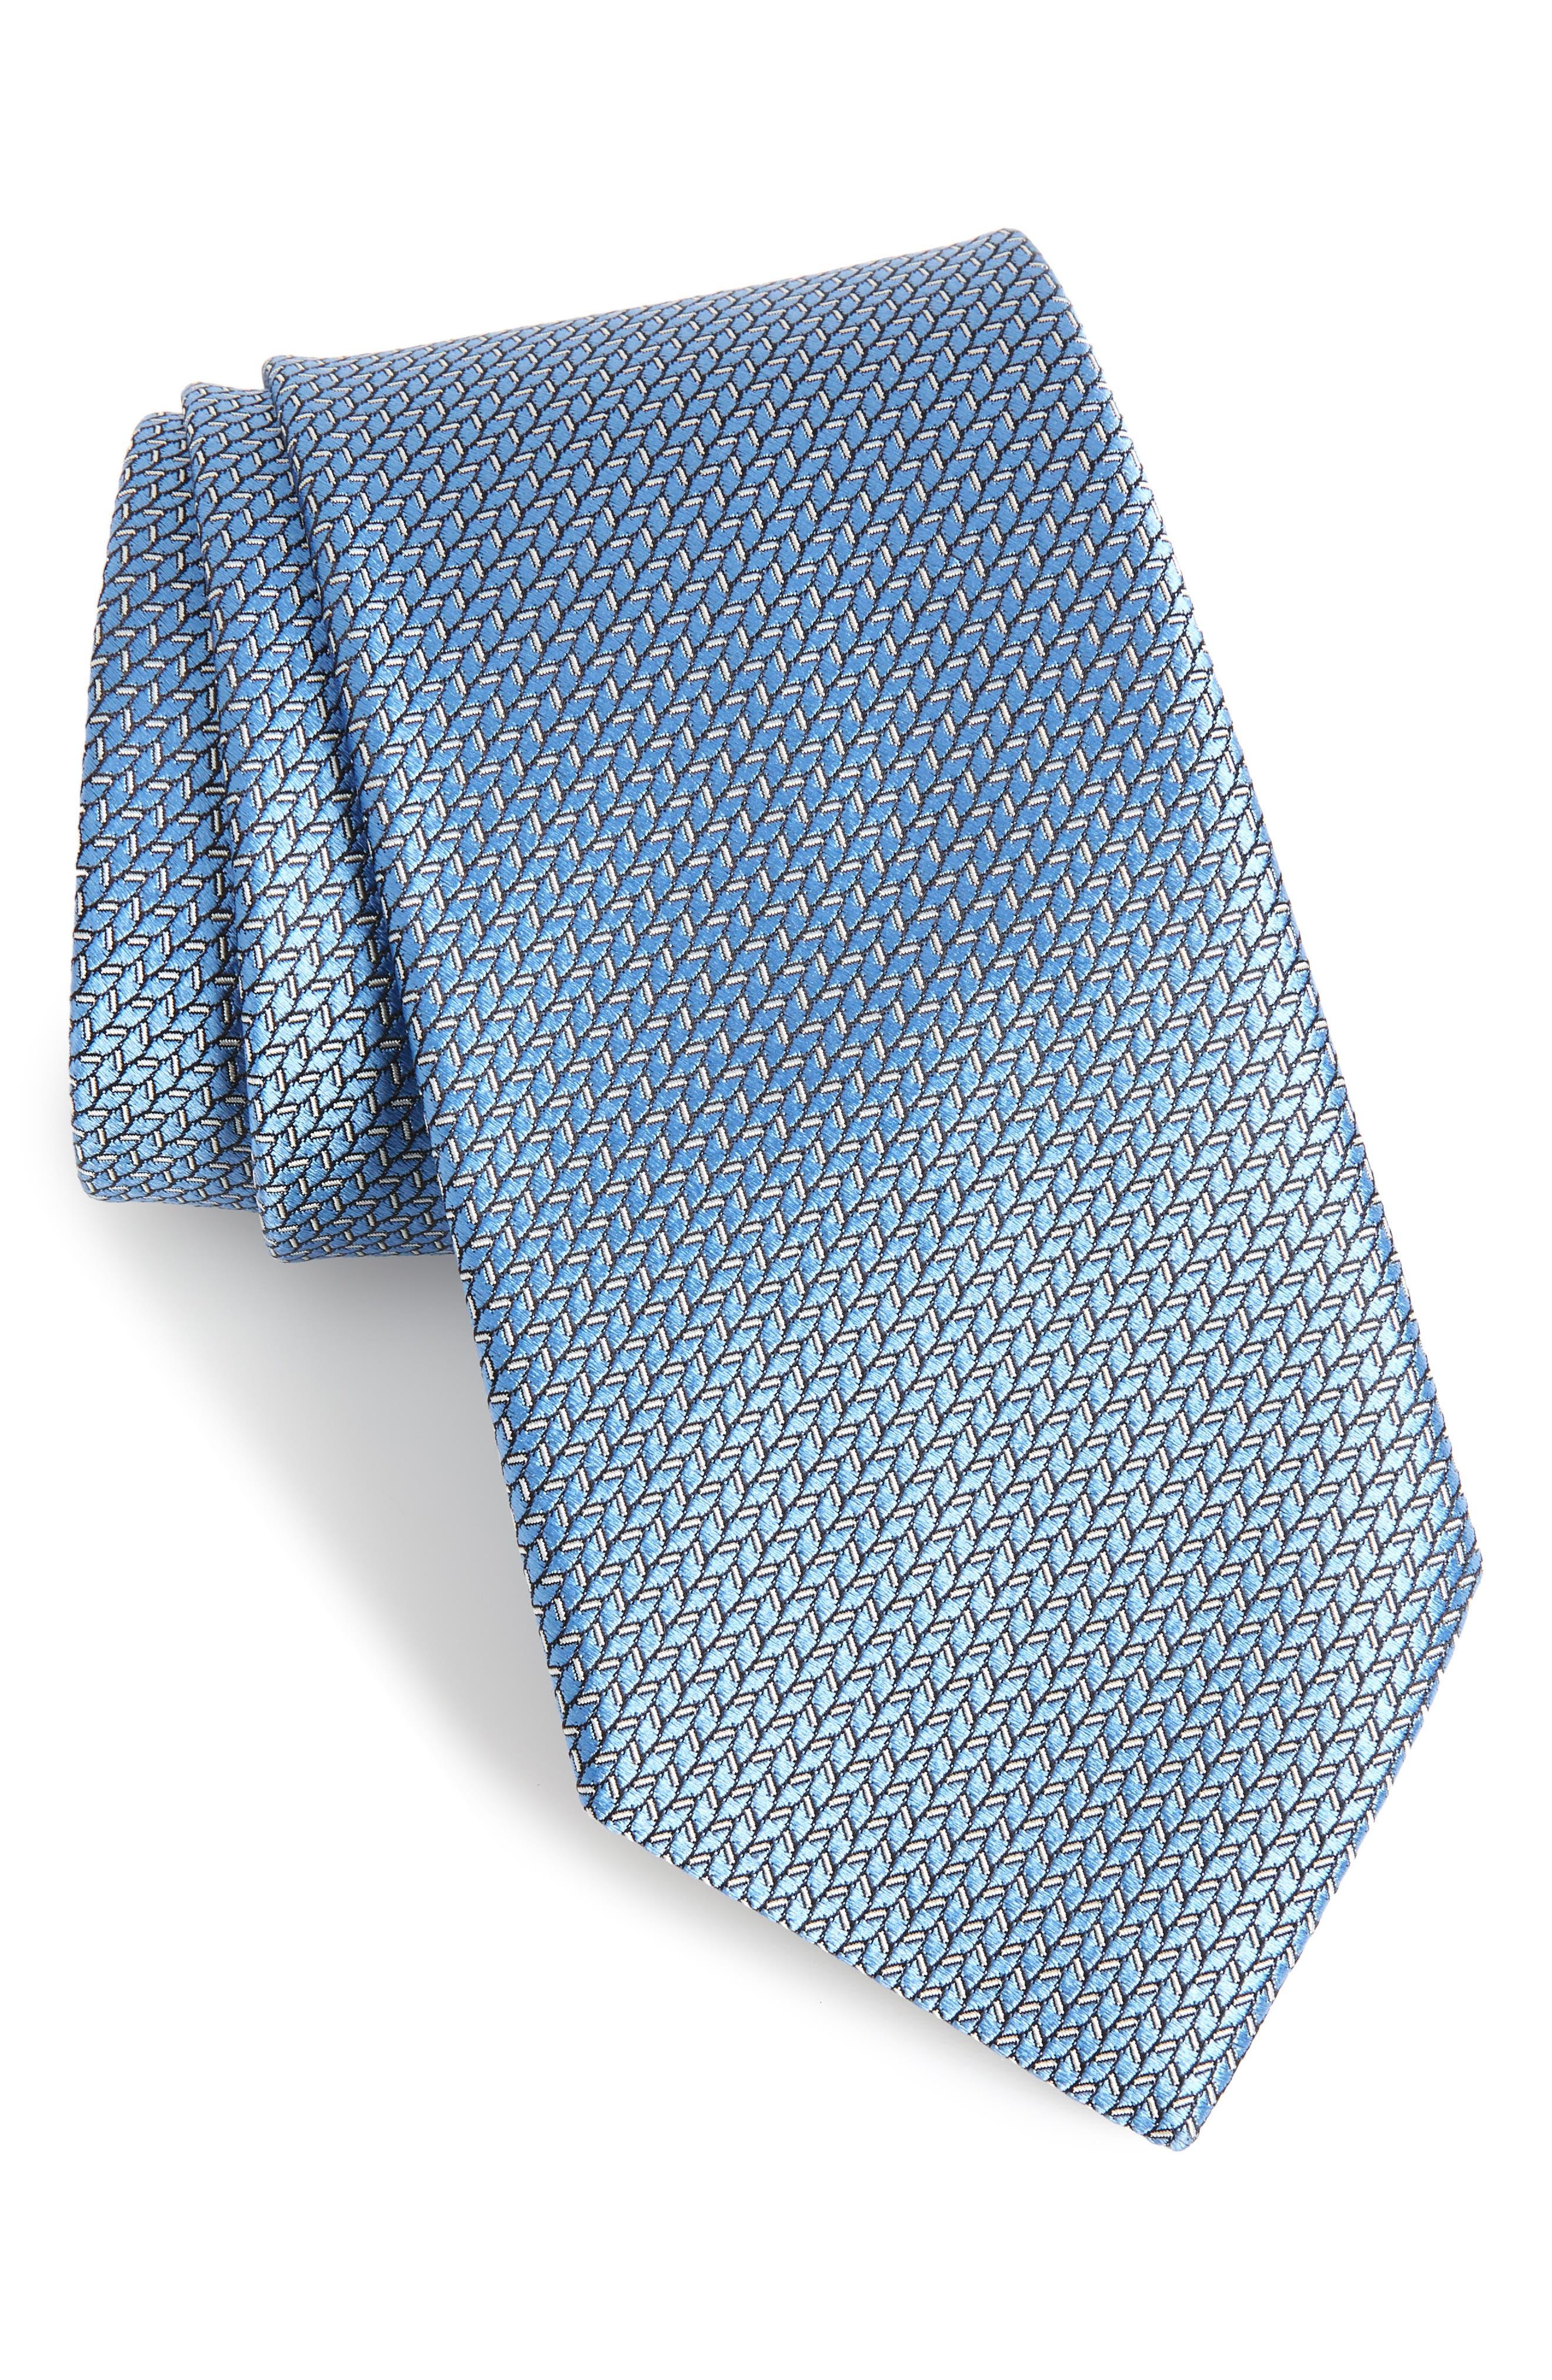 Ermengildo Zegna Herringbone Silk Tie,                             Main thumbnail 1, color,                             BLUE